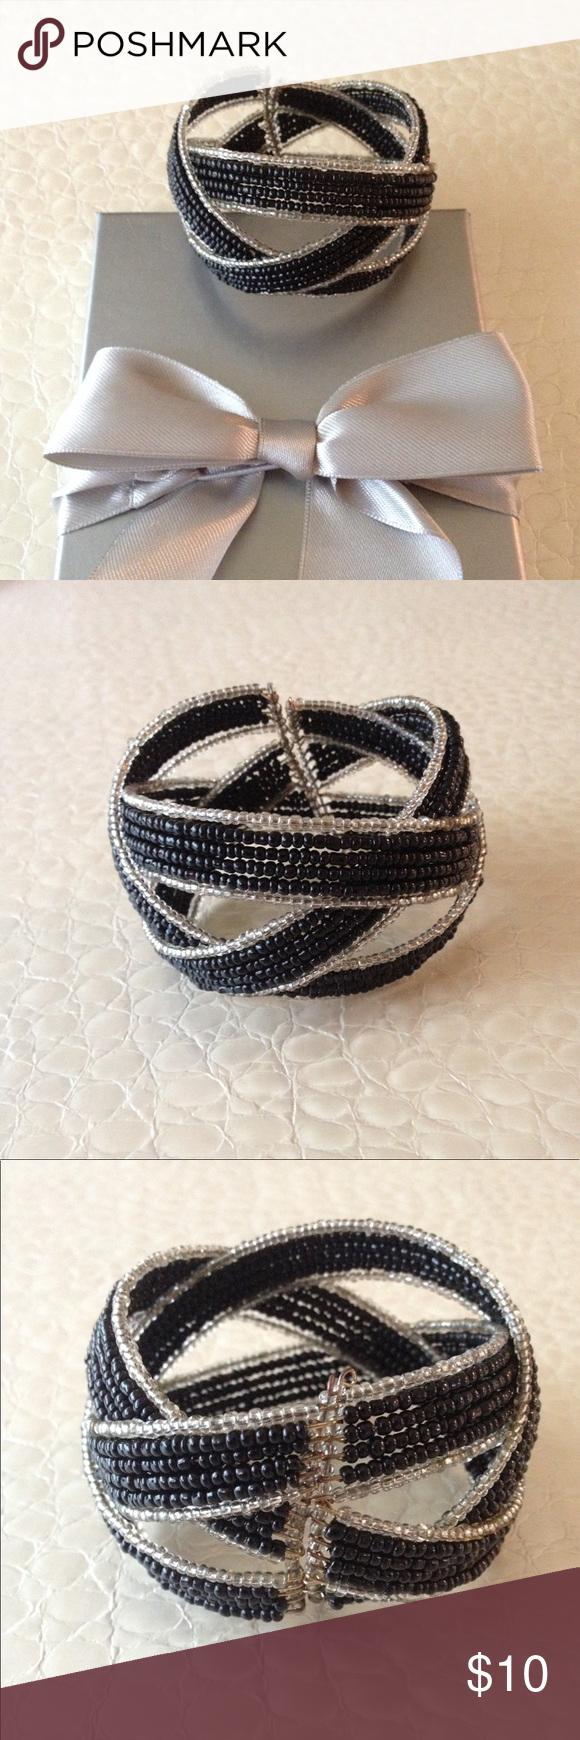 Selling this Black and silver beaded bangle on Poshmark! My username is: funfashionfun. #shopmycloset #poshmark #fashion #shopping #style #forsale #Jewelry